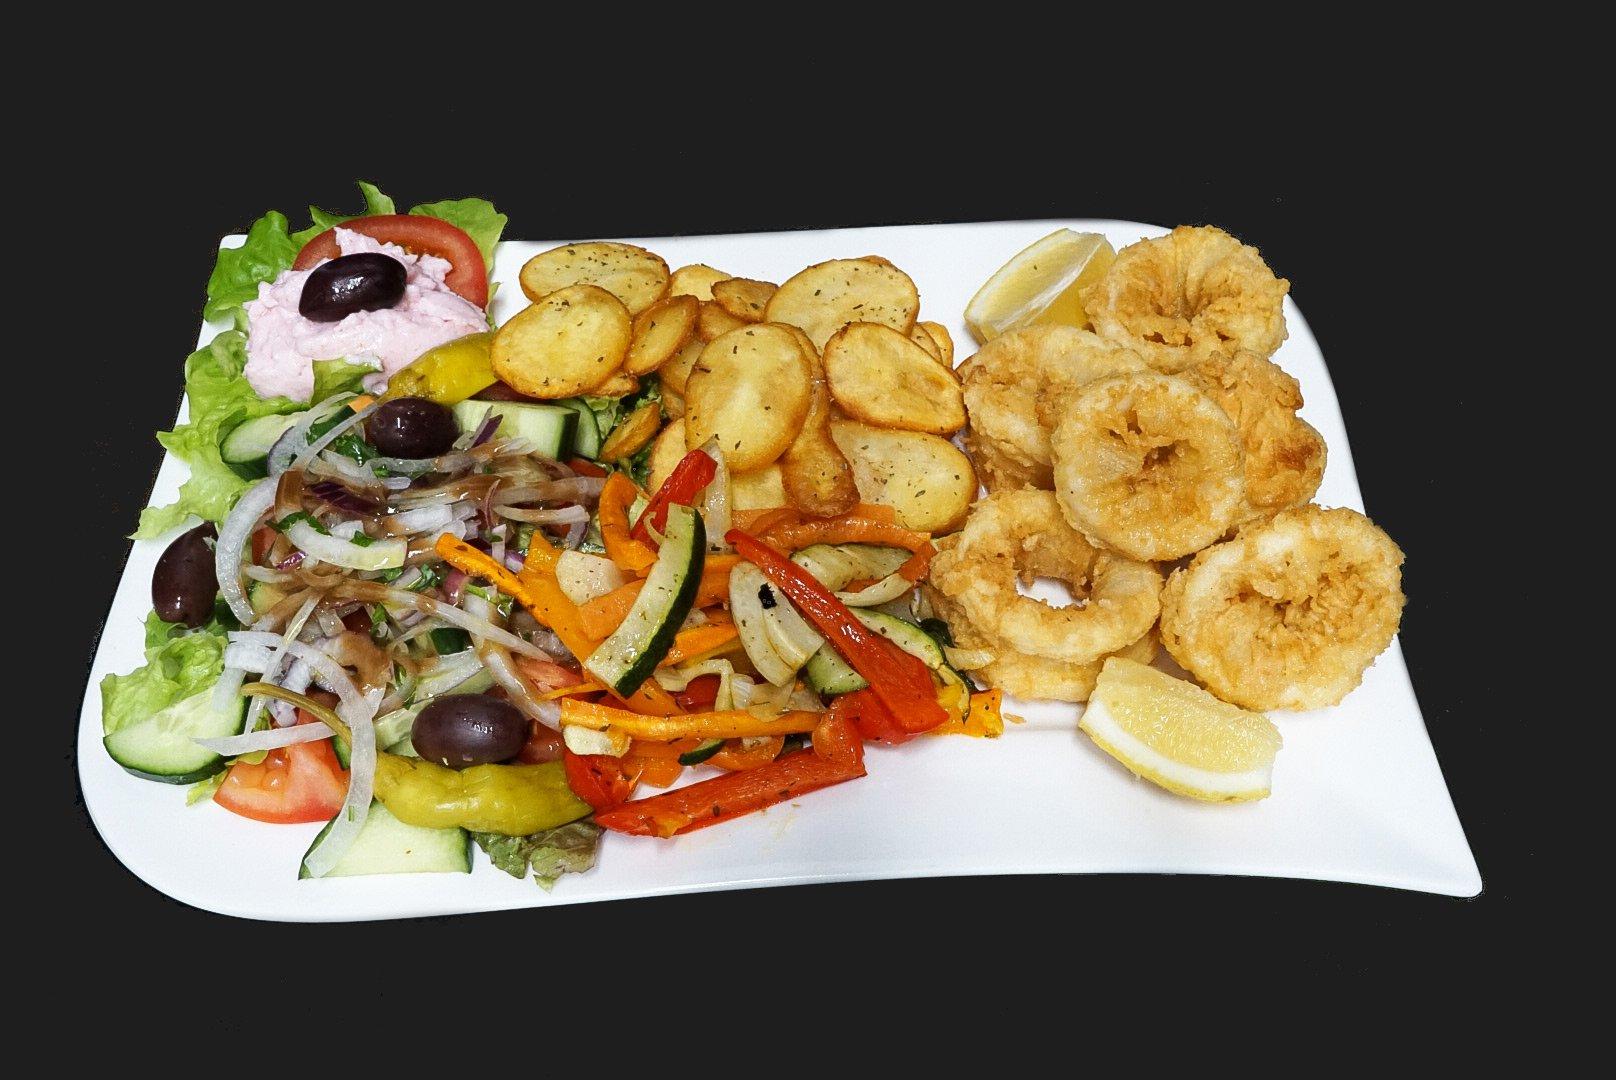 Restaurant Halde Ulm-Gögglingen - Calamari